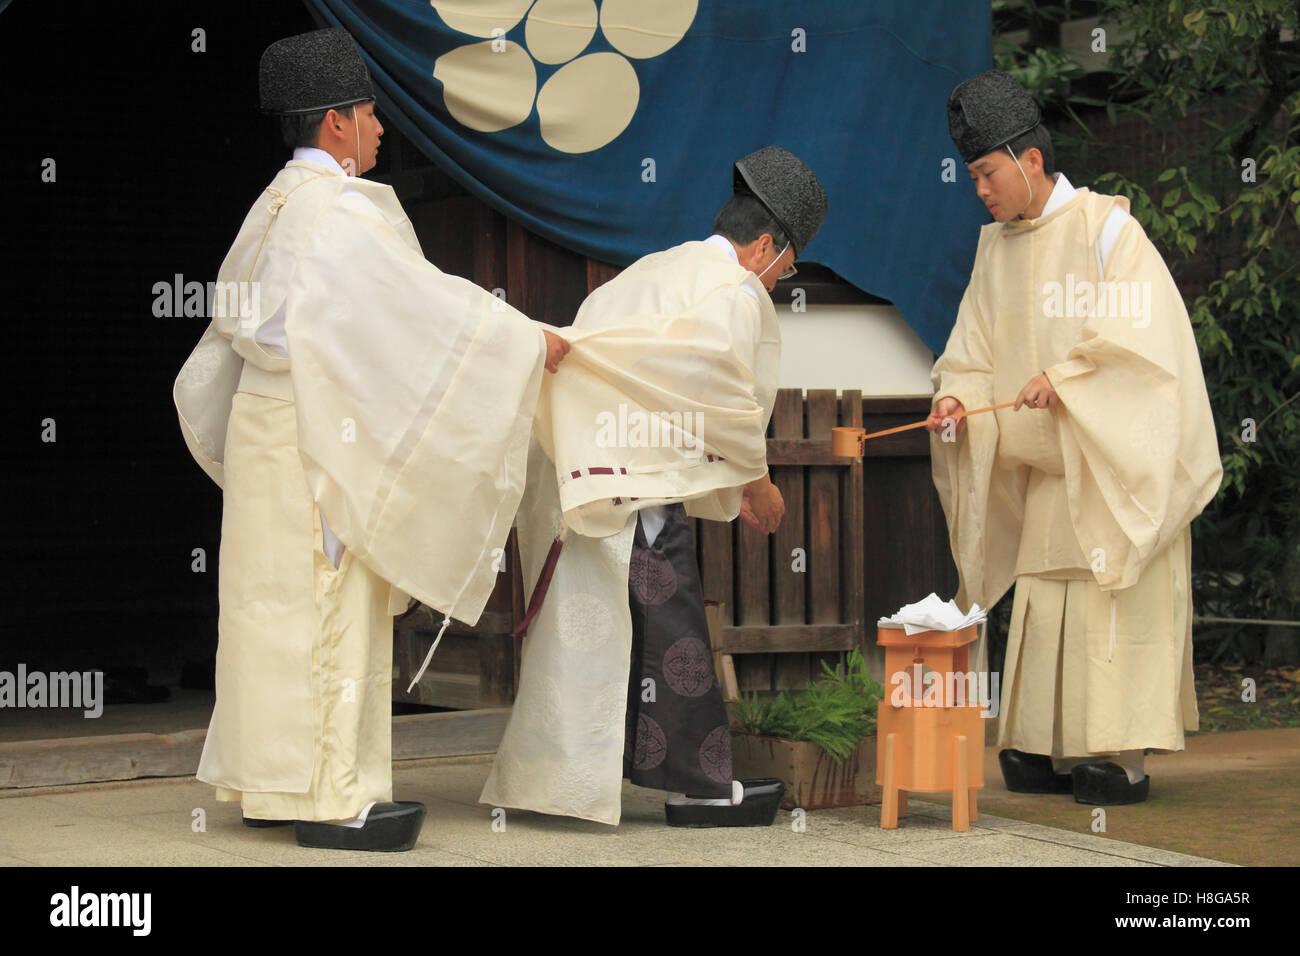 Japan, Kyoto, Zuiki festival, shinto priests, purification ceremony, - Stock Image